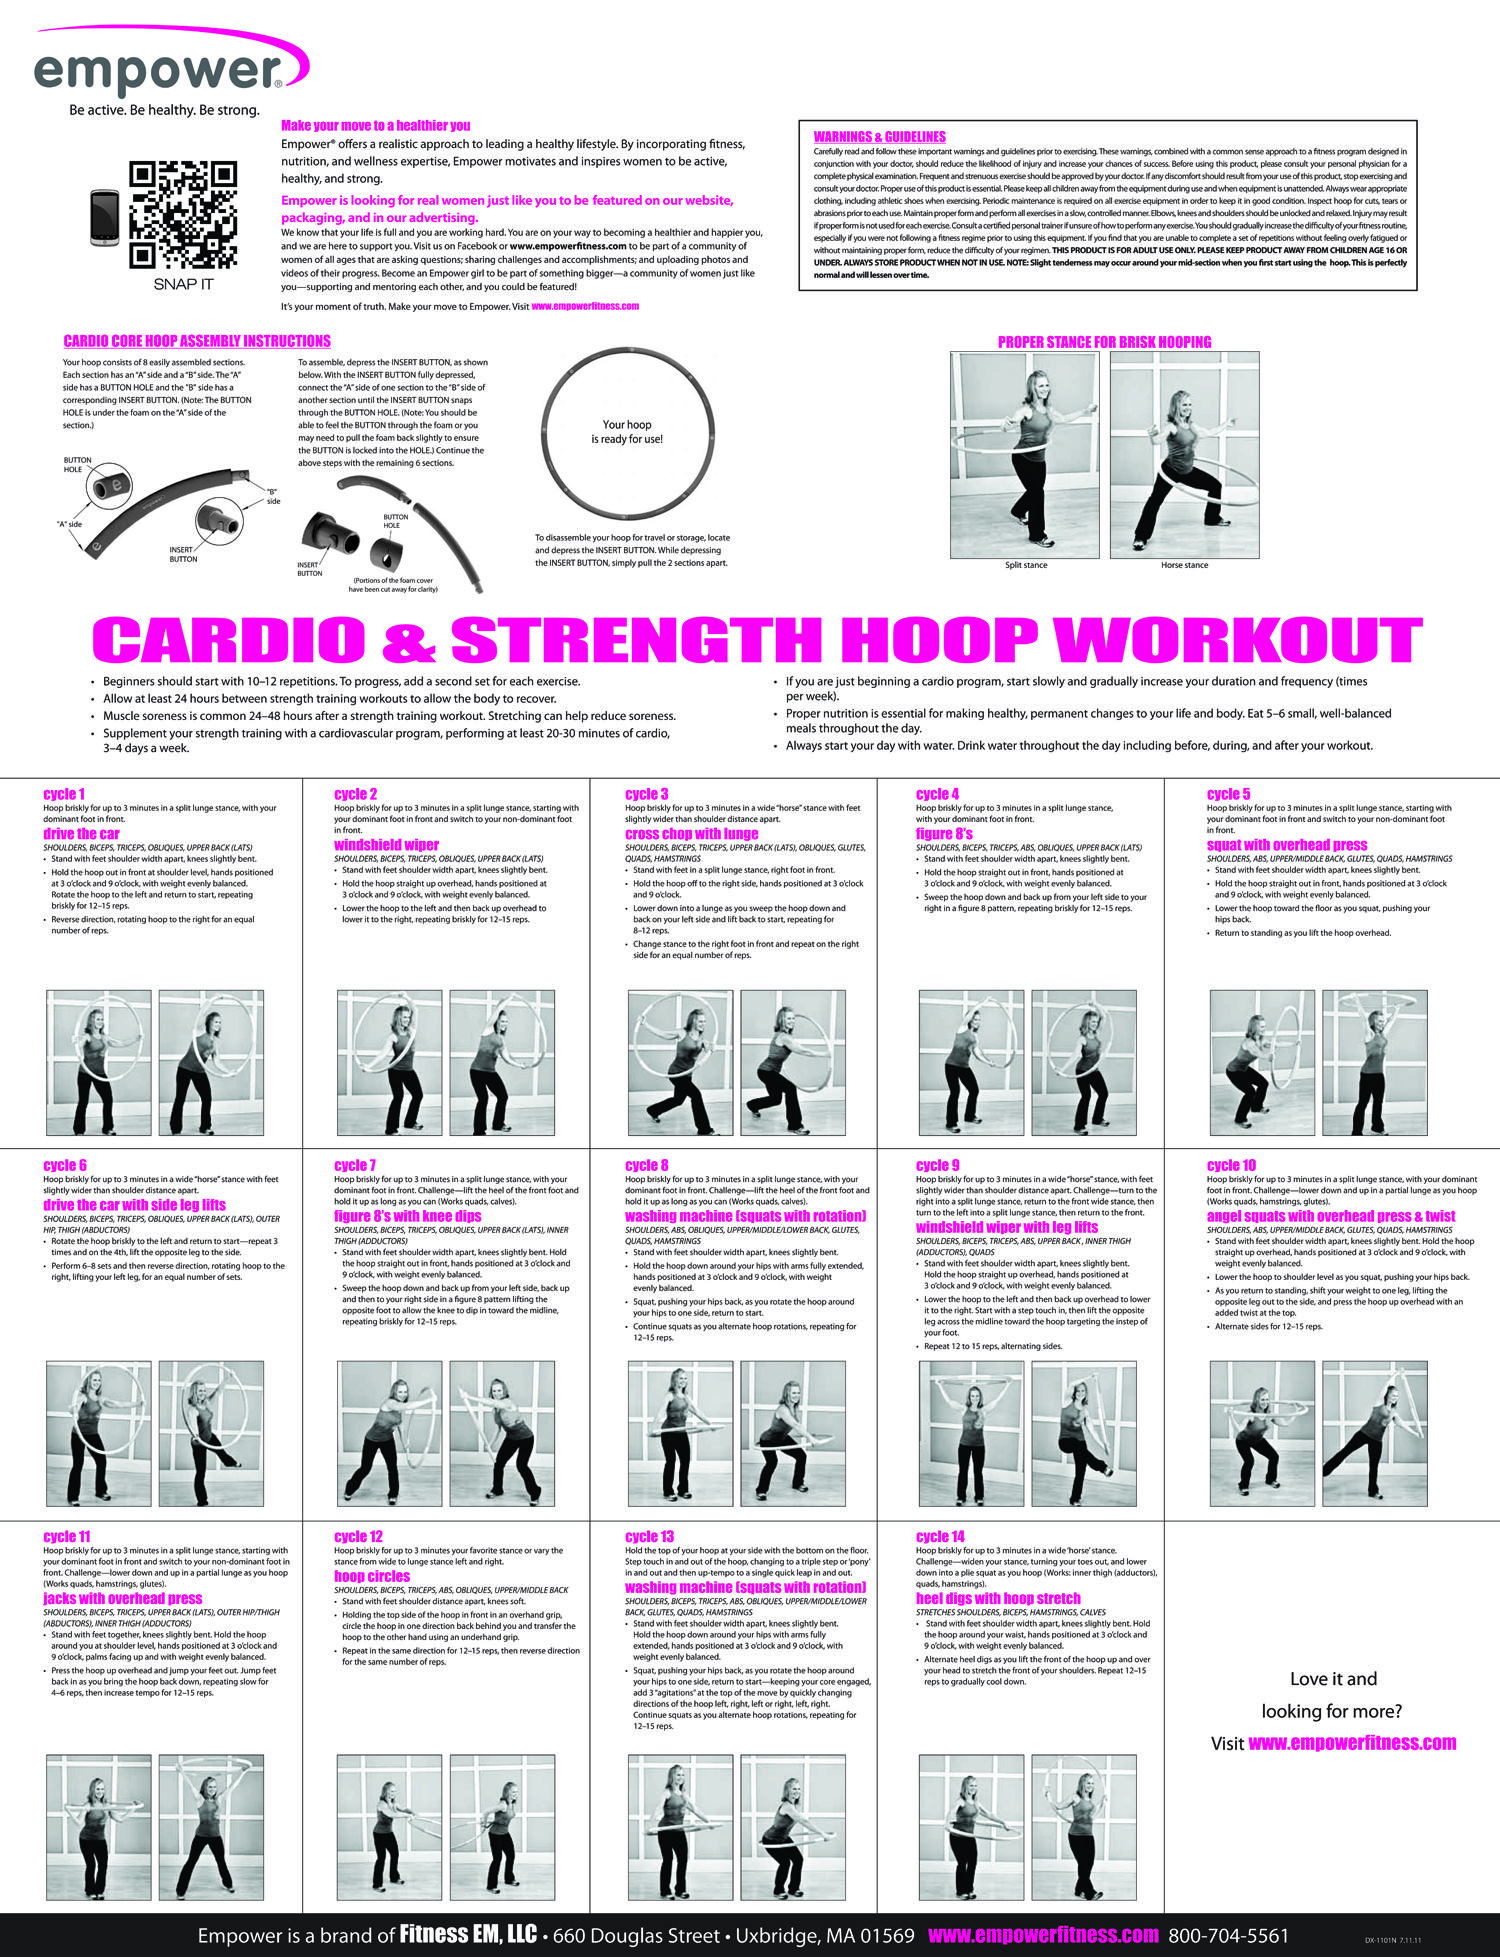 Empower Fitness Cardio Strength Hoop Workout Got My Hoop Just